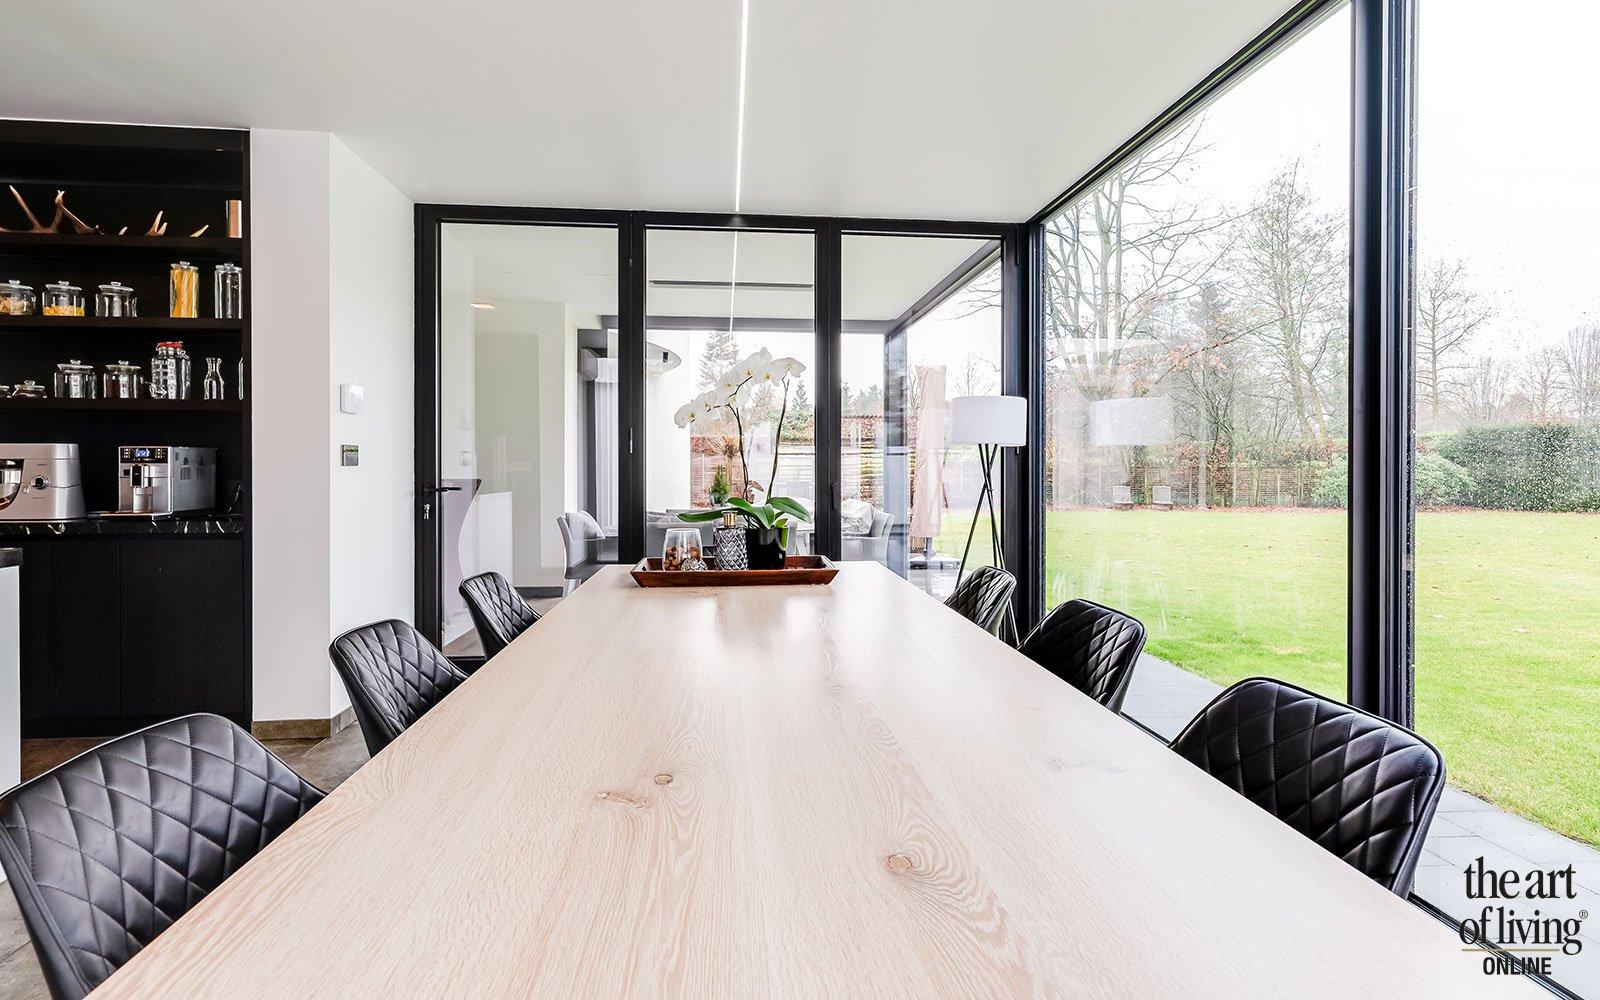 Open architectuur met symmetrisch karakter, Lise Luyten, interieurdesign, maatwerk keuken